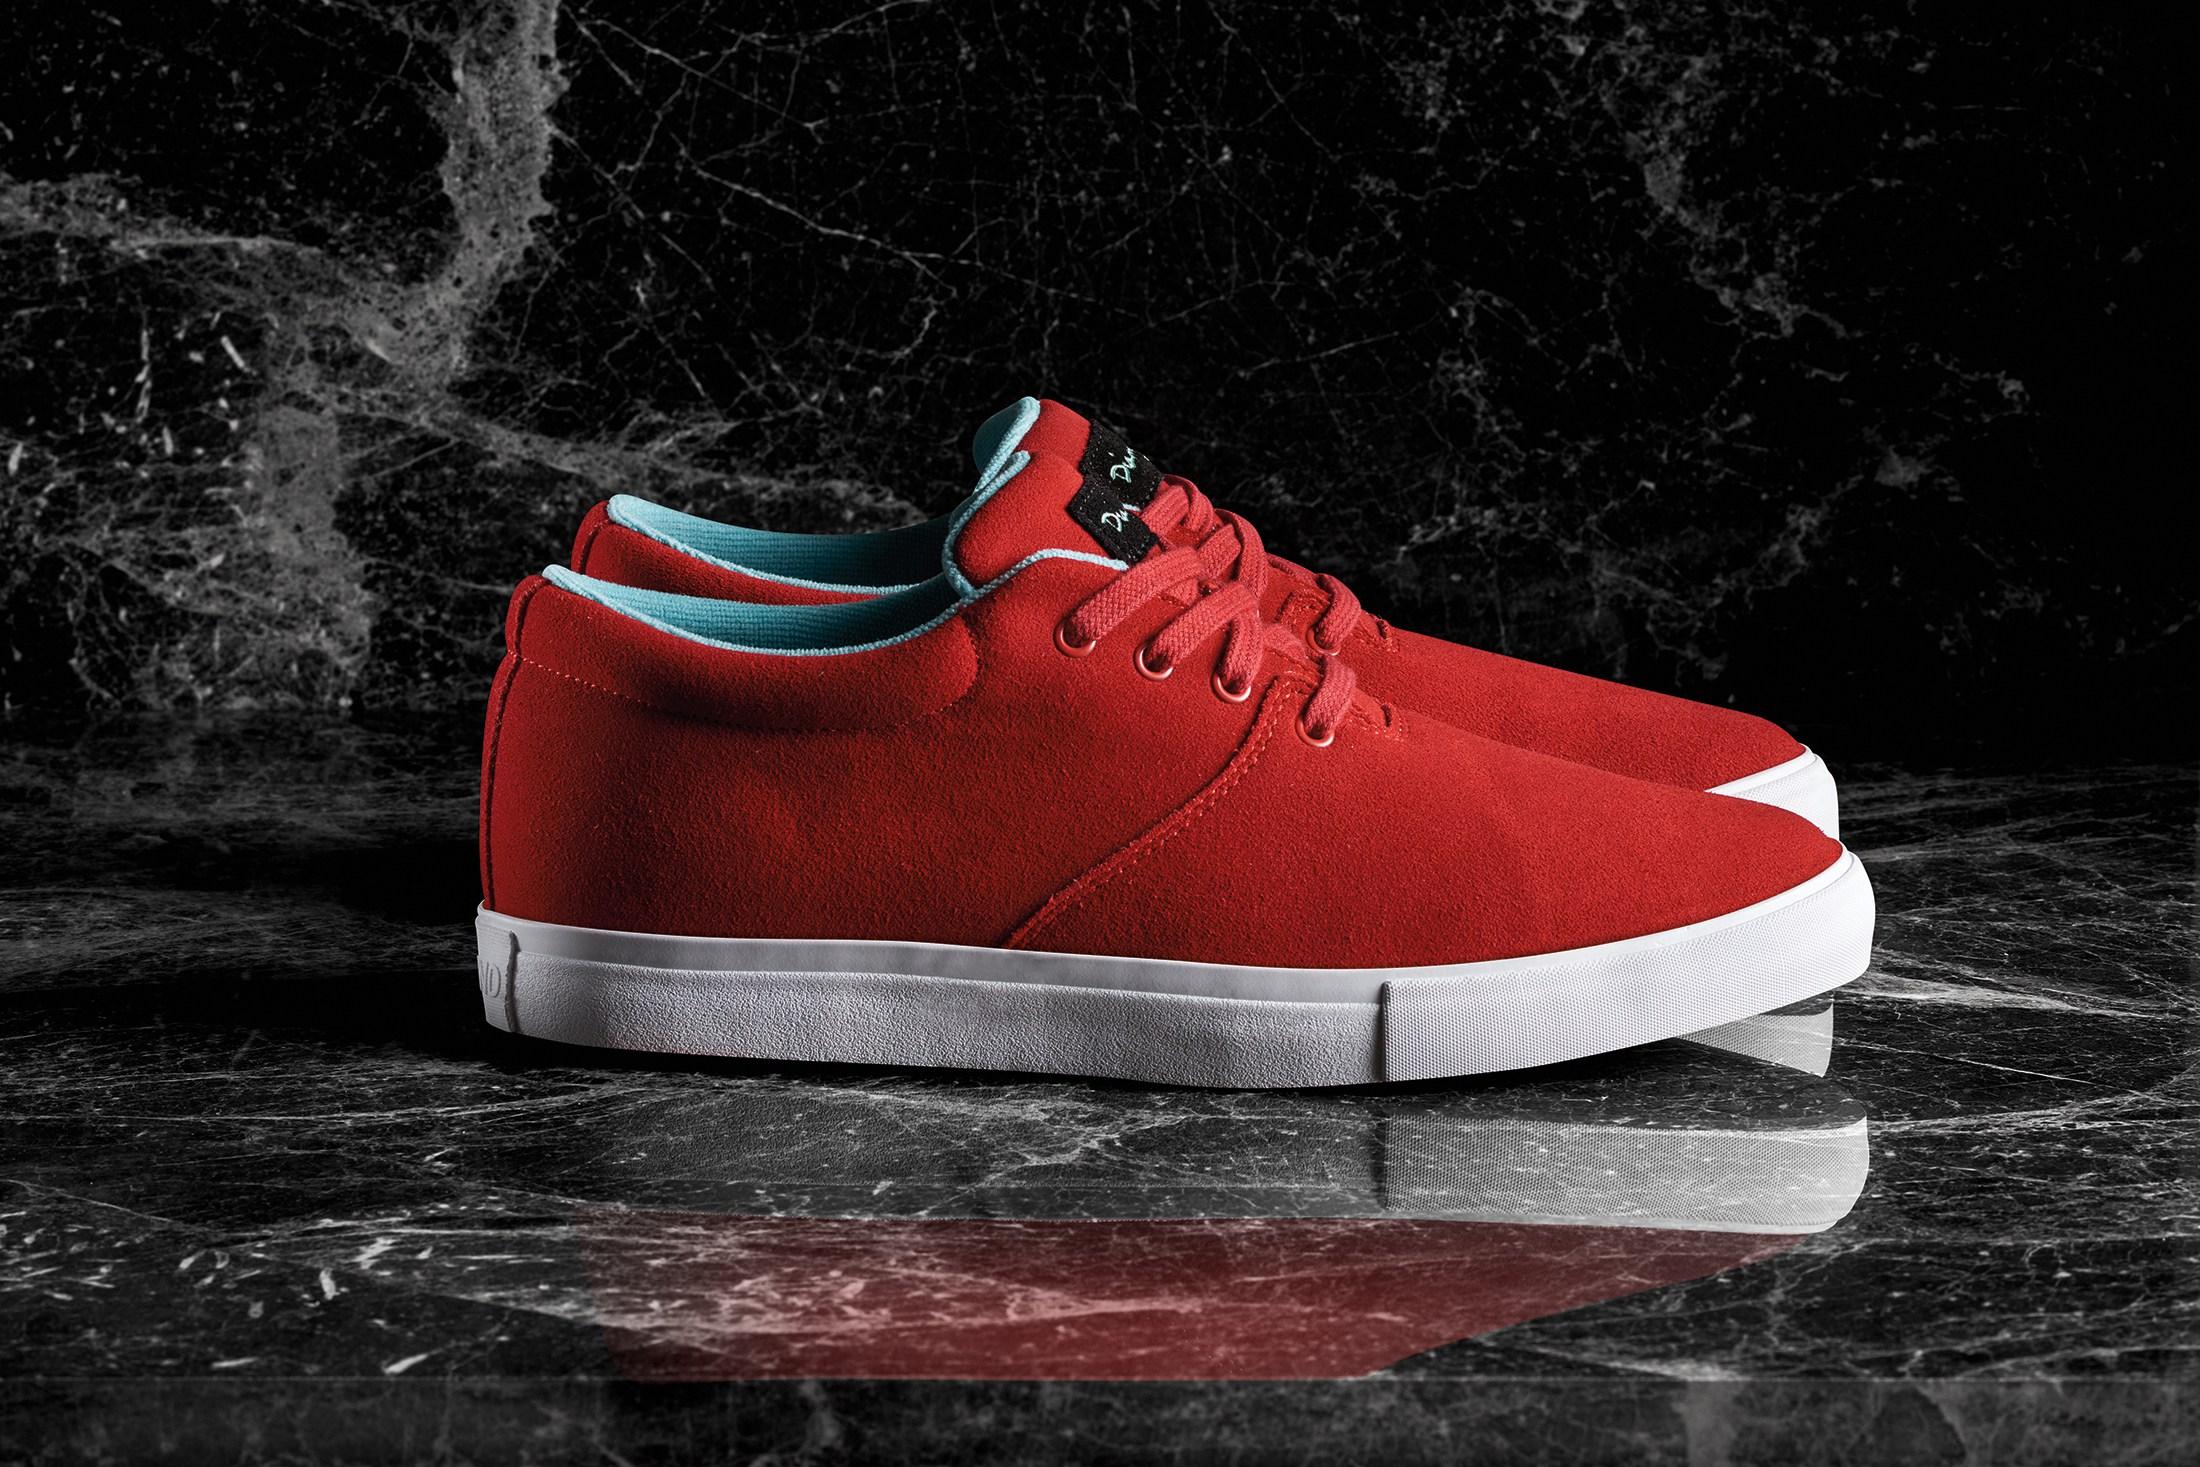 diamond-supply-co-launches-footwear-9.jpg